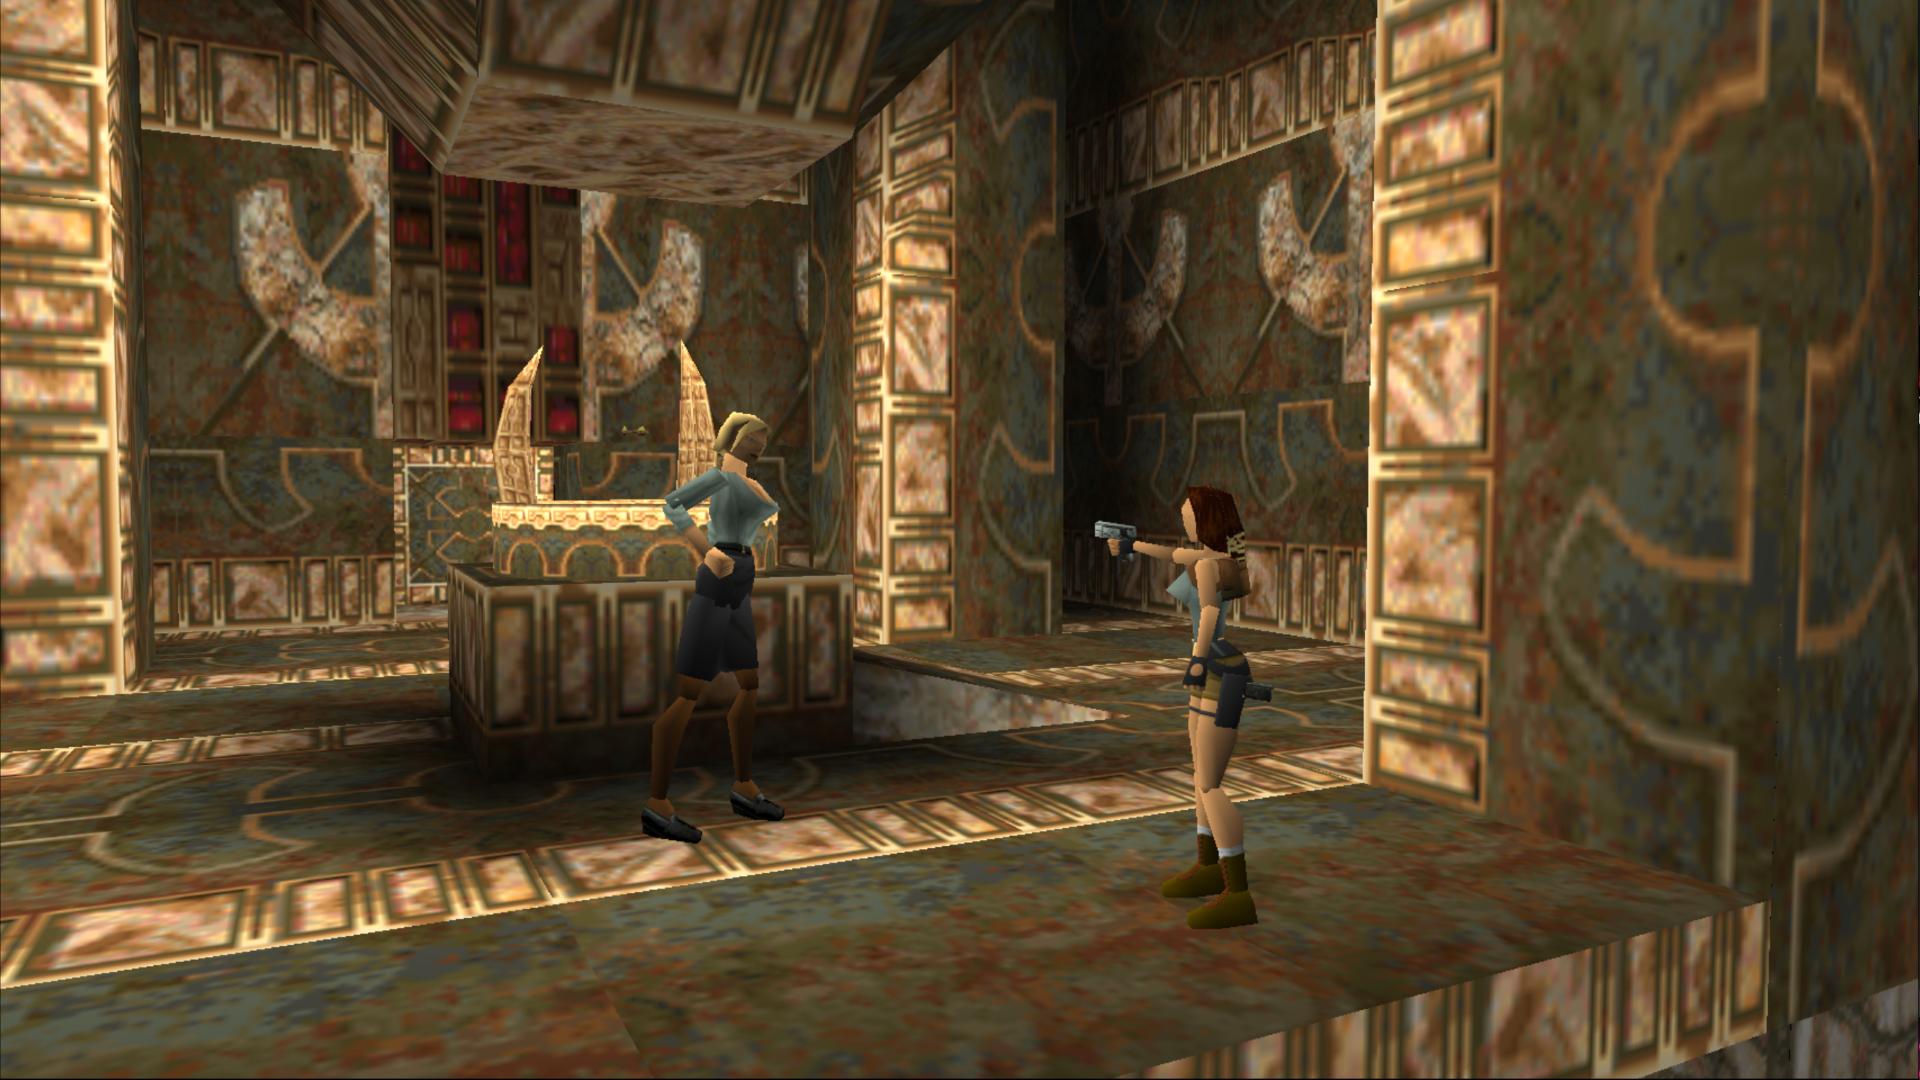 Lara and Natla in a cut-scene